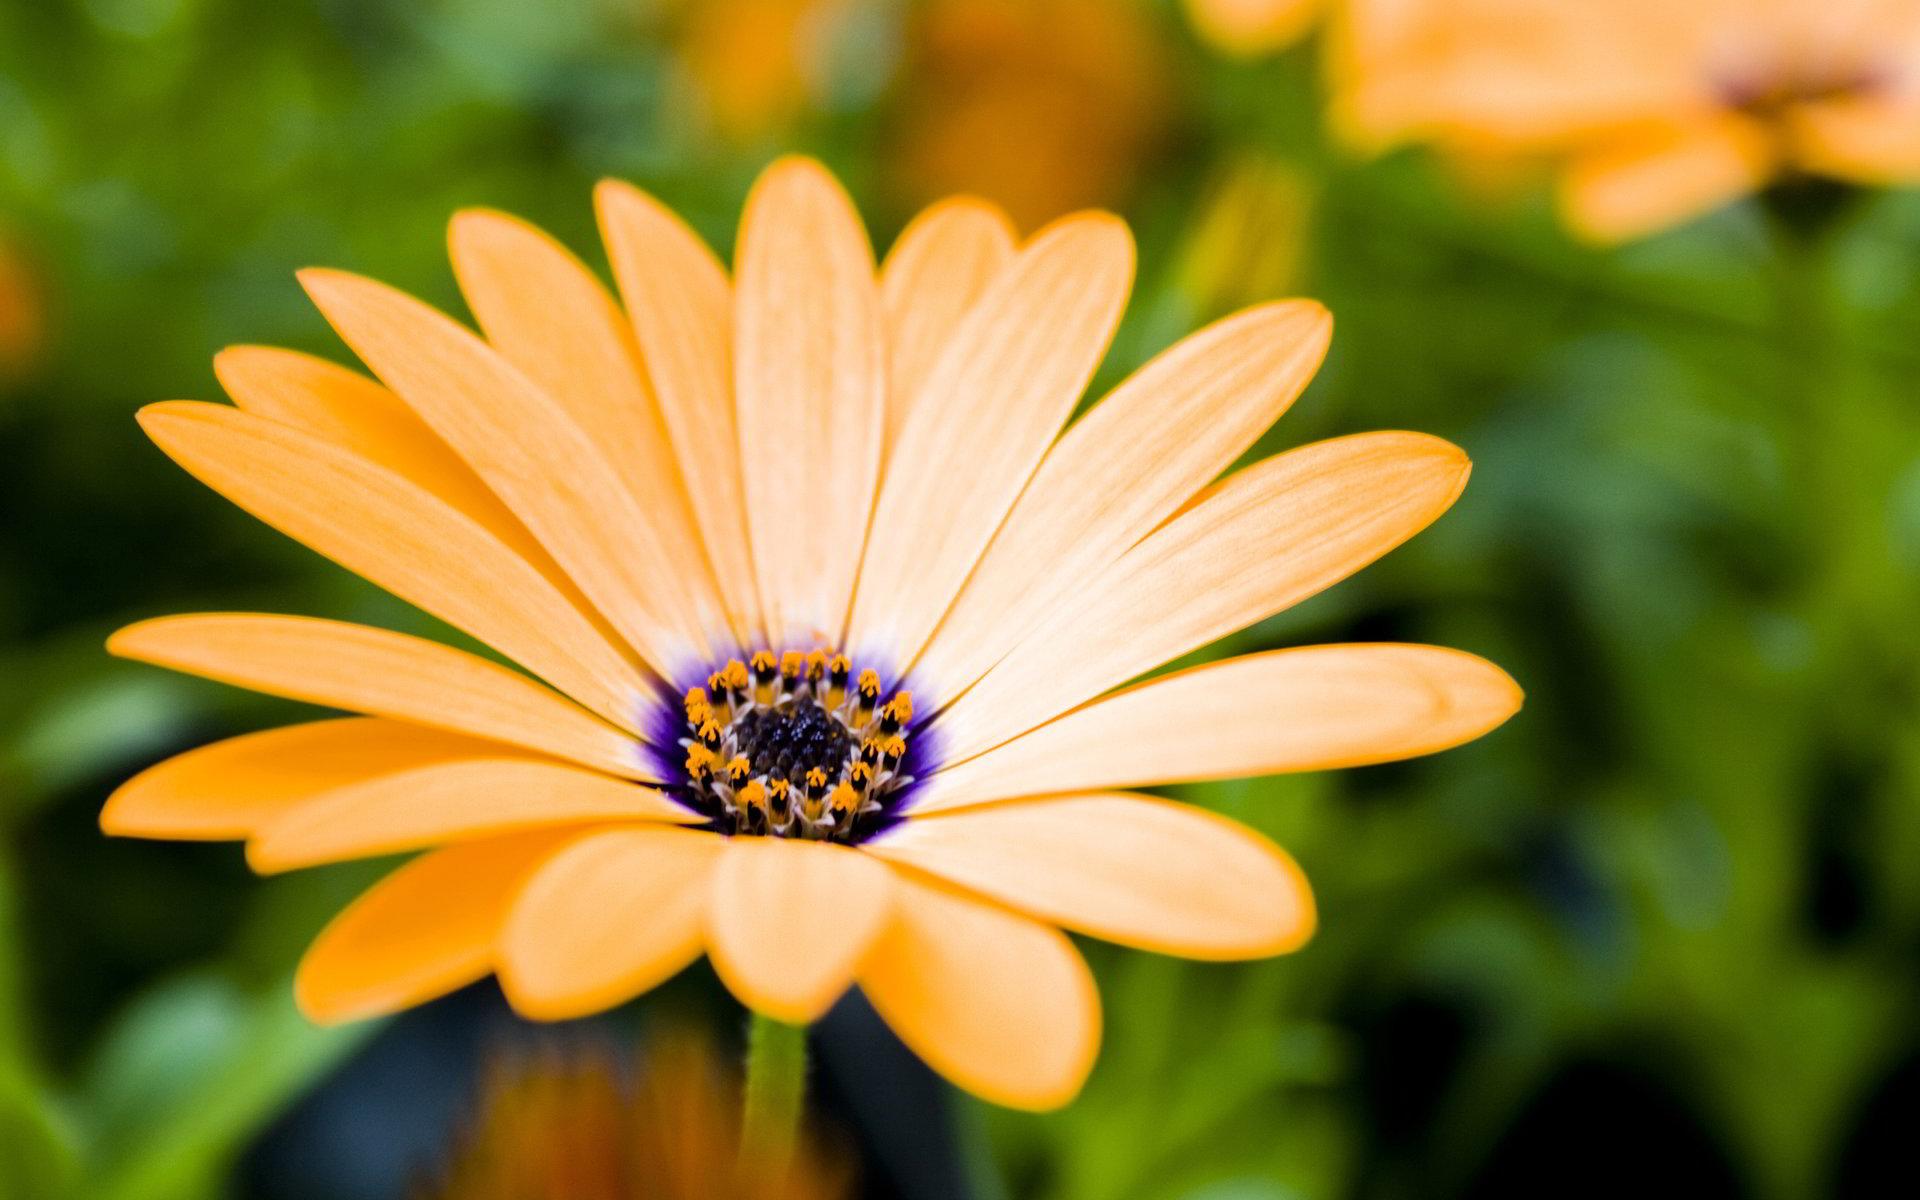 hinh anh hoa cuc dep 2